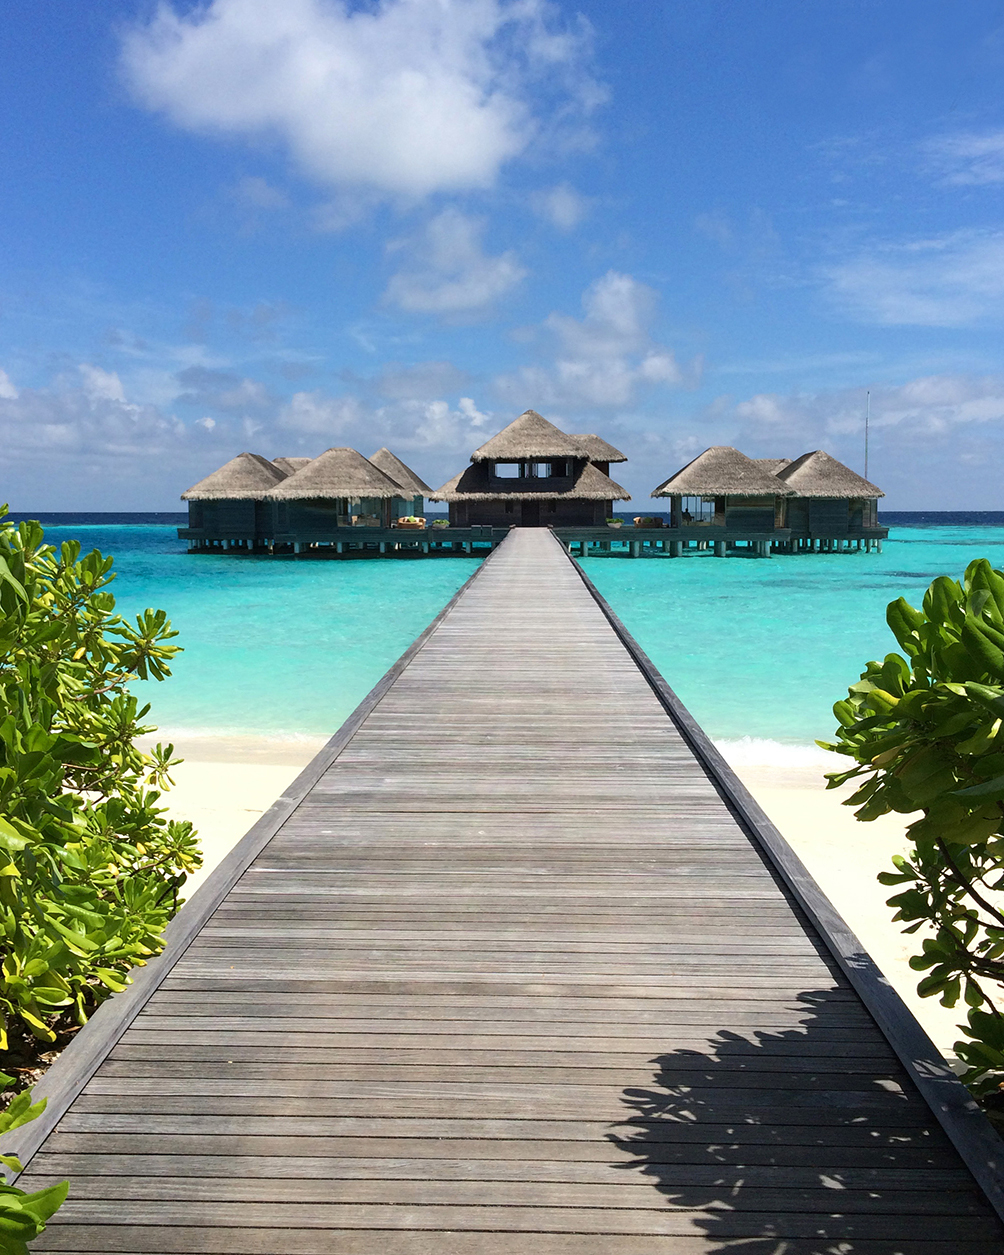 romantic-places-huvafen-fushi-spa-maldives-0215.jpg